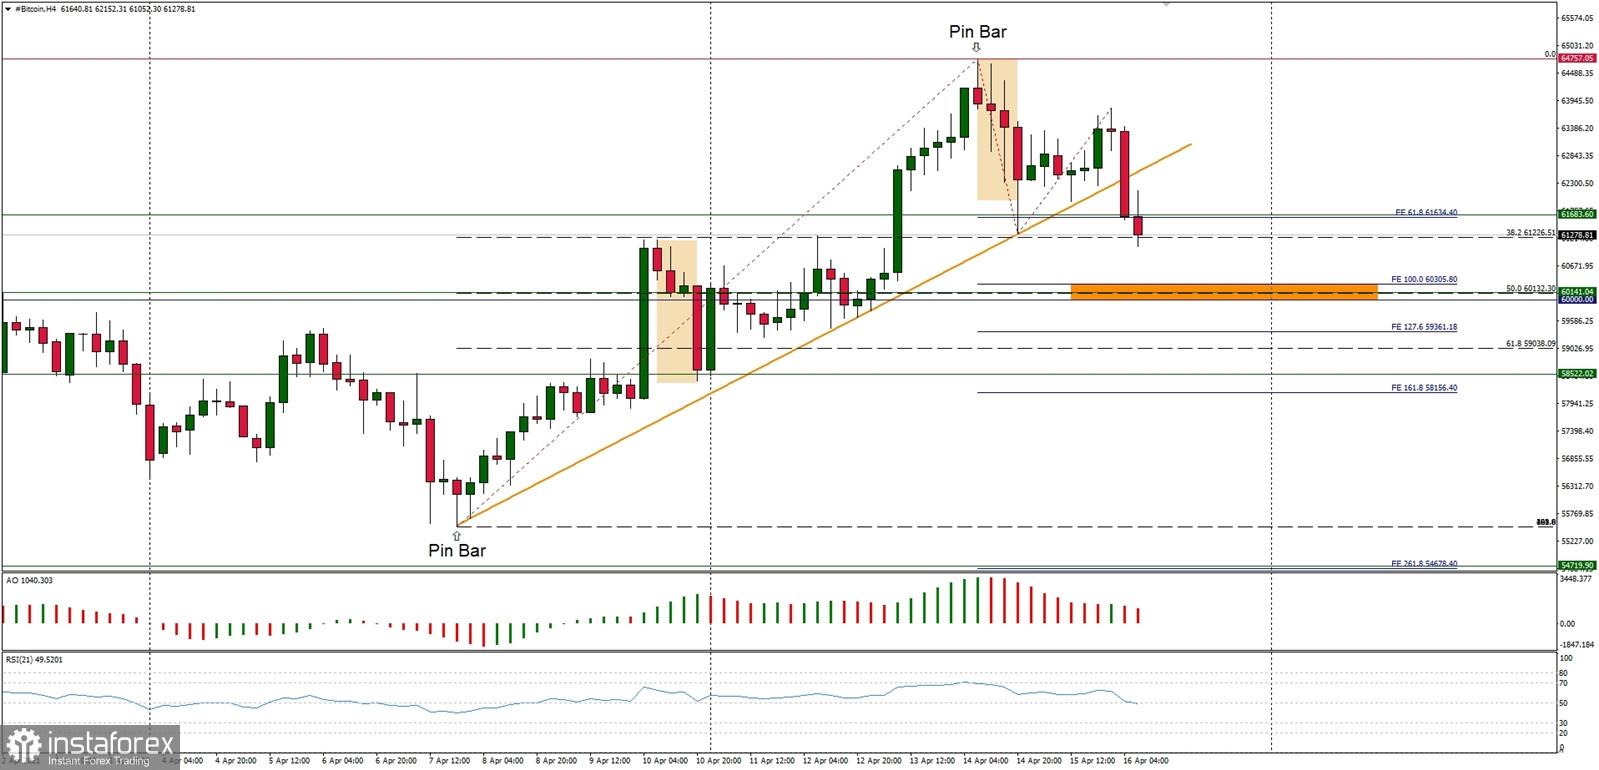 Analisis Teknikal BTC / USD untuk 16 April 2021